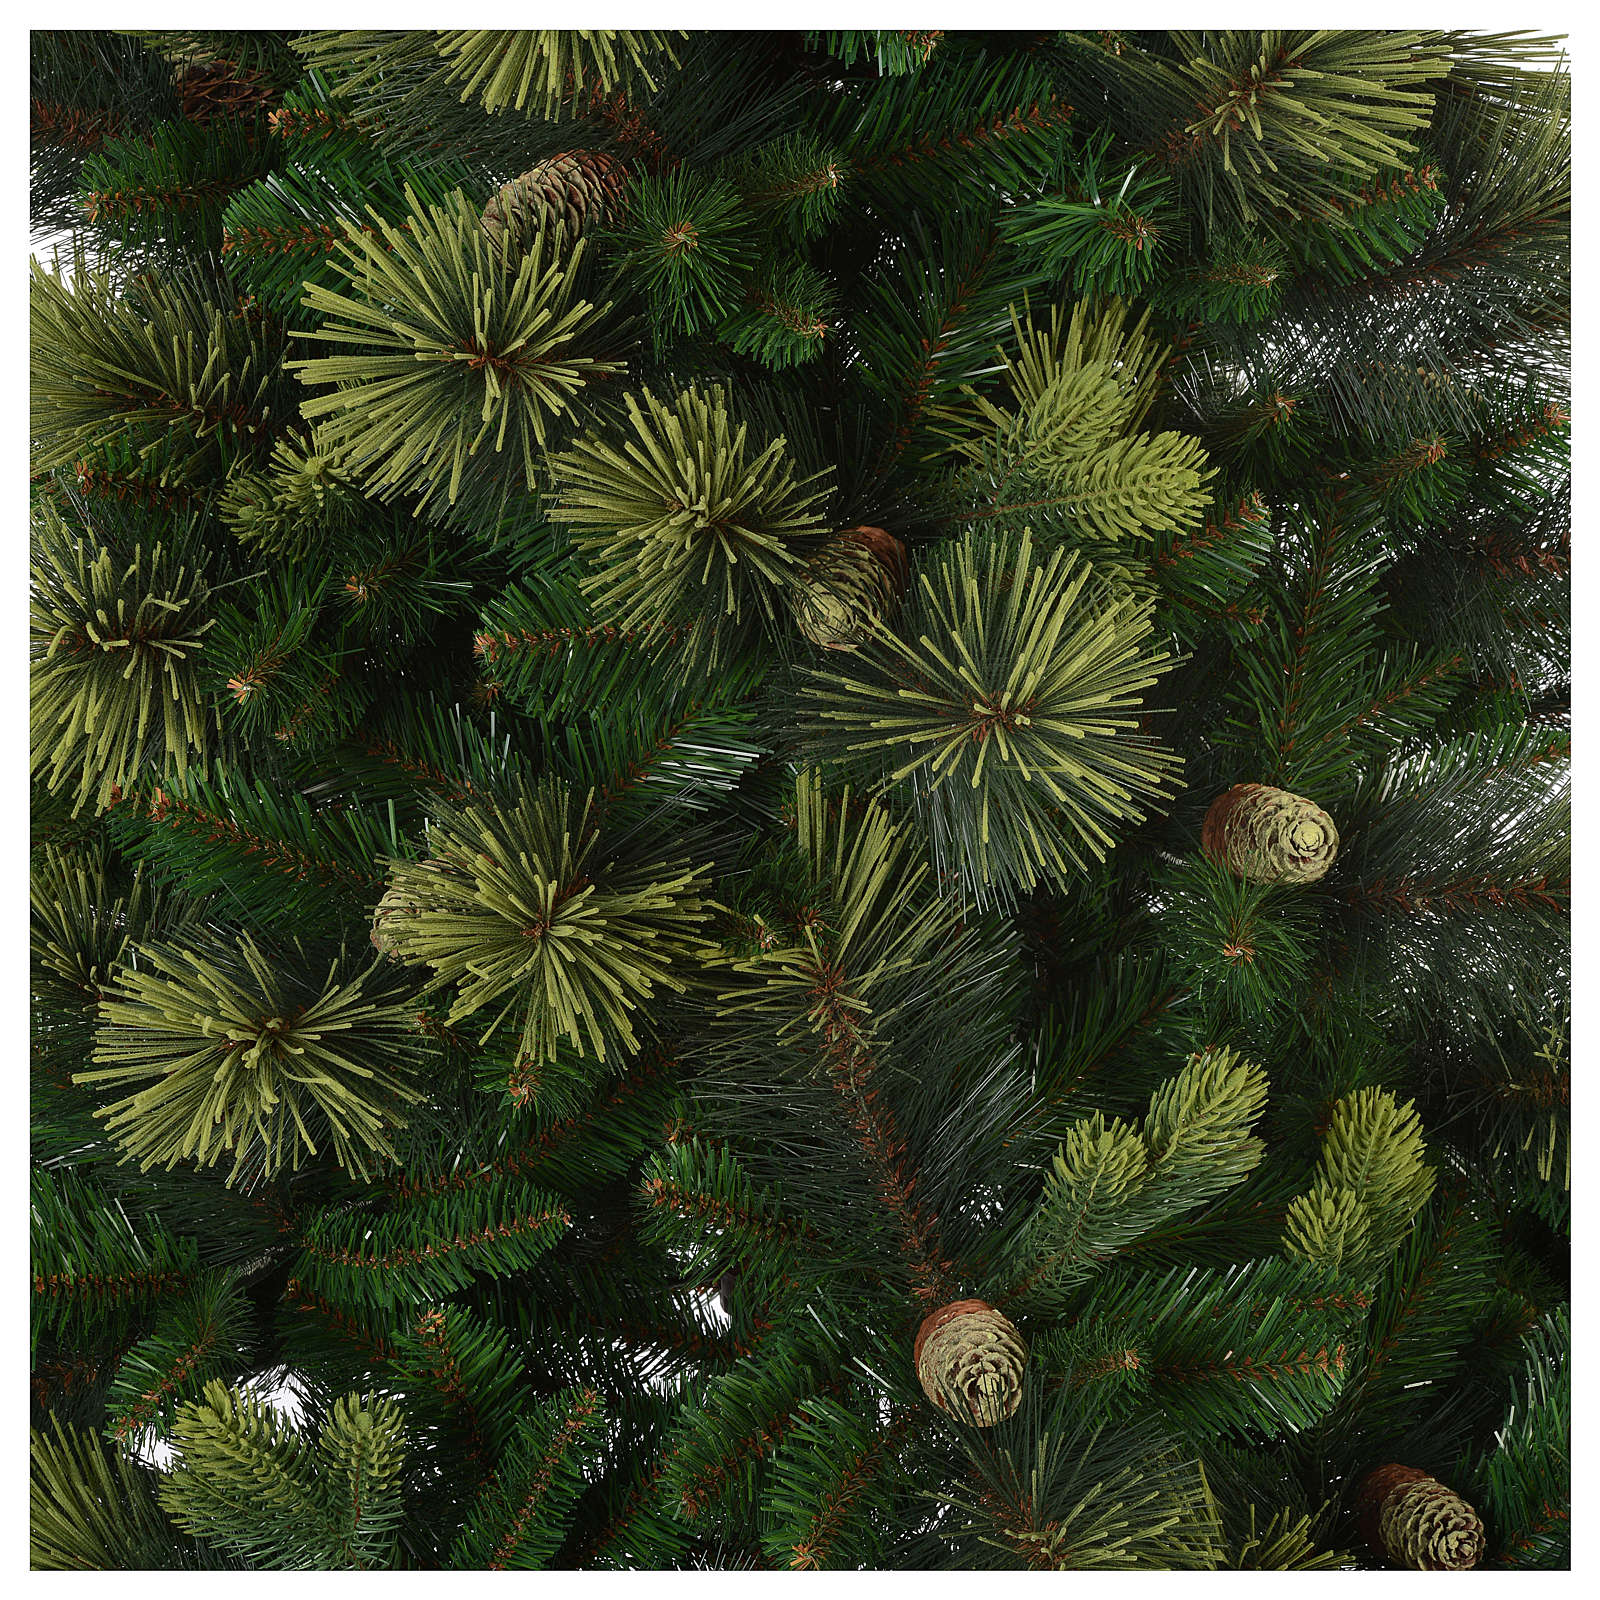 Árbol de Navidad 225 cm verde con piñas modelo Carolina 3